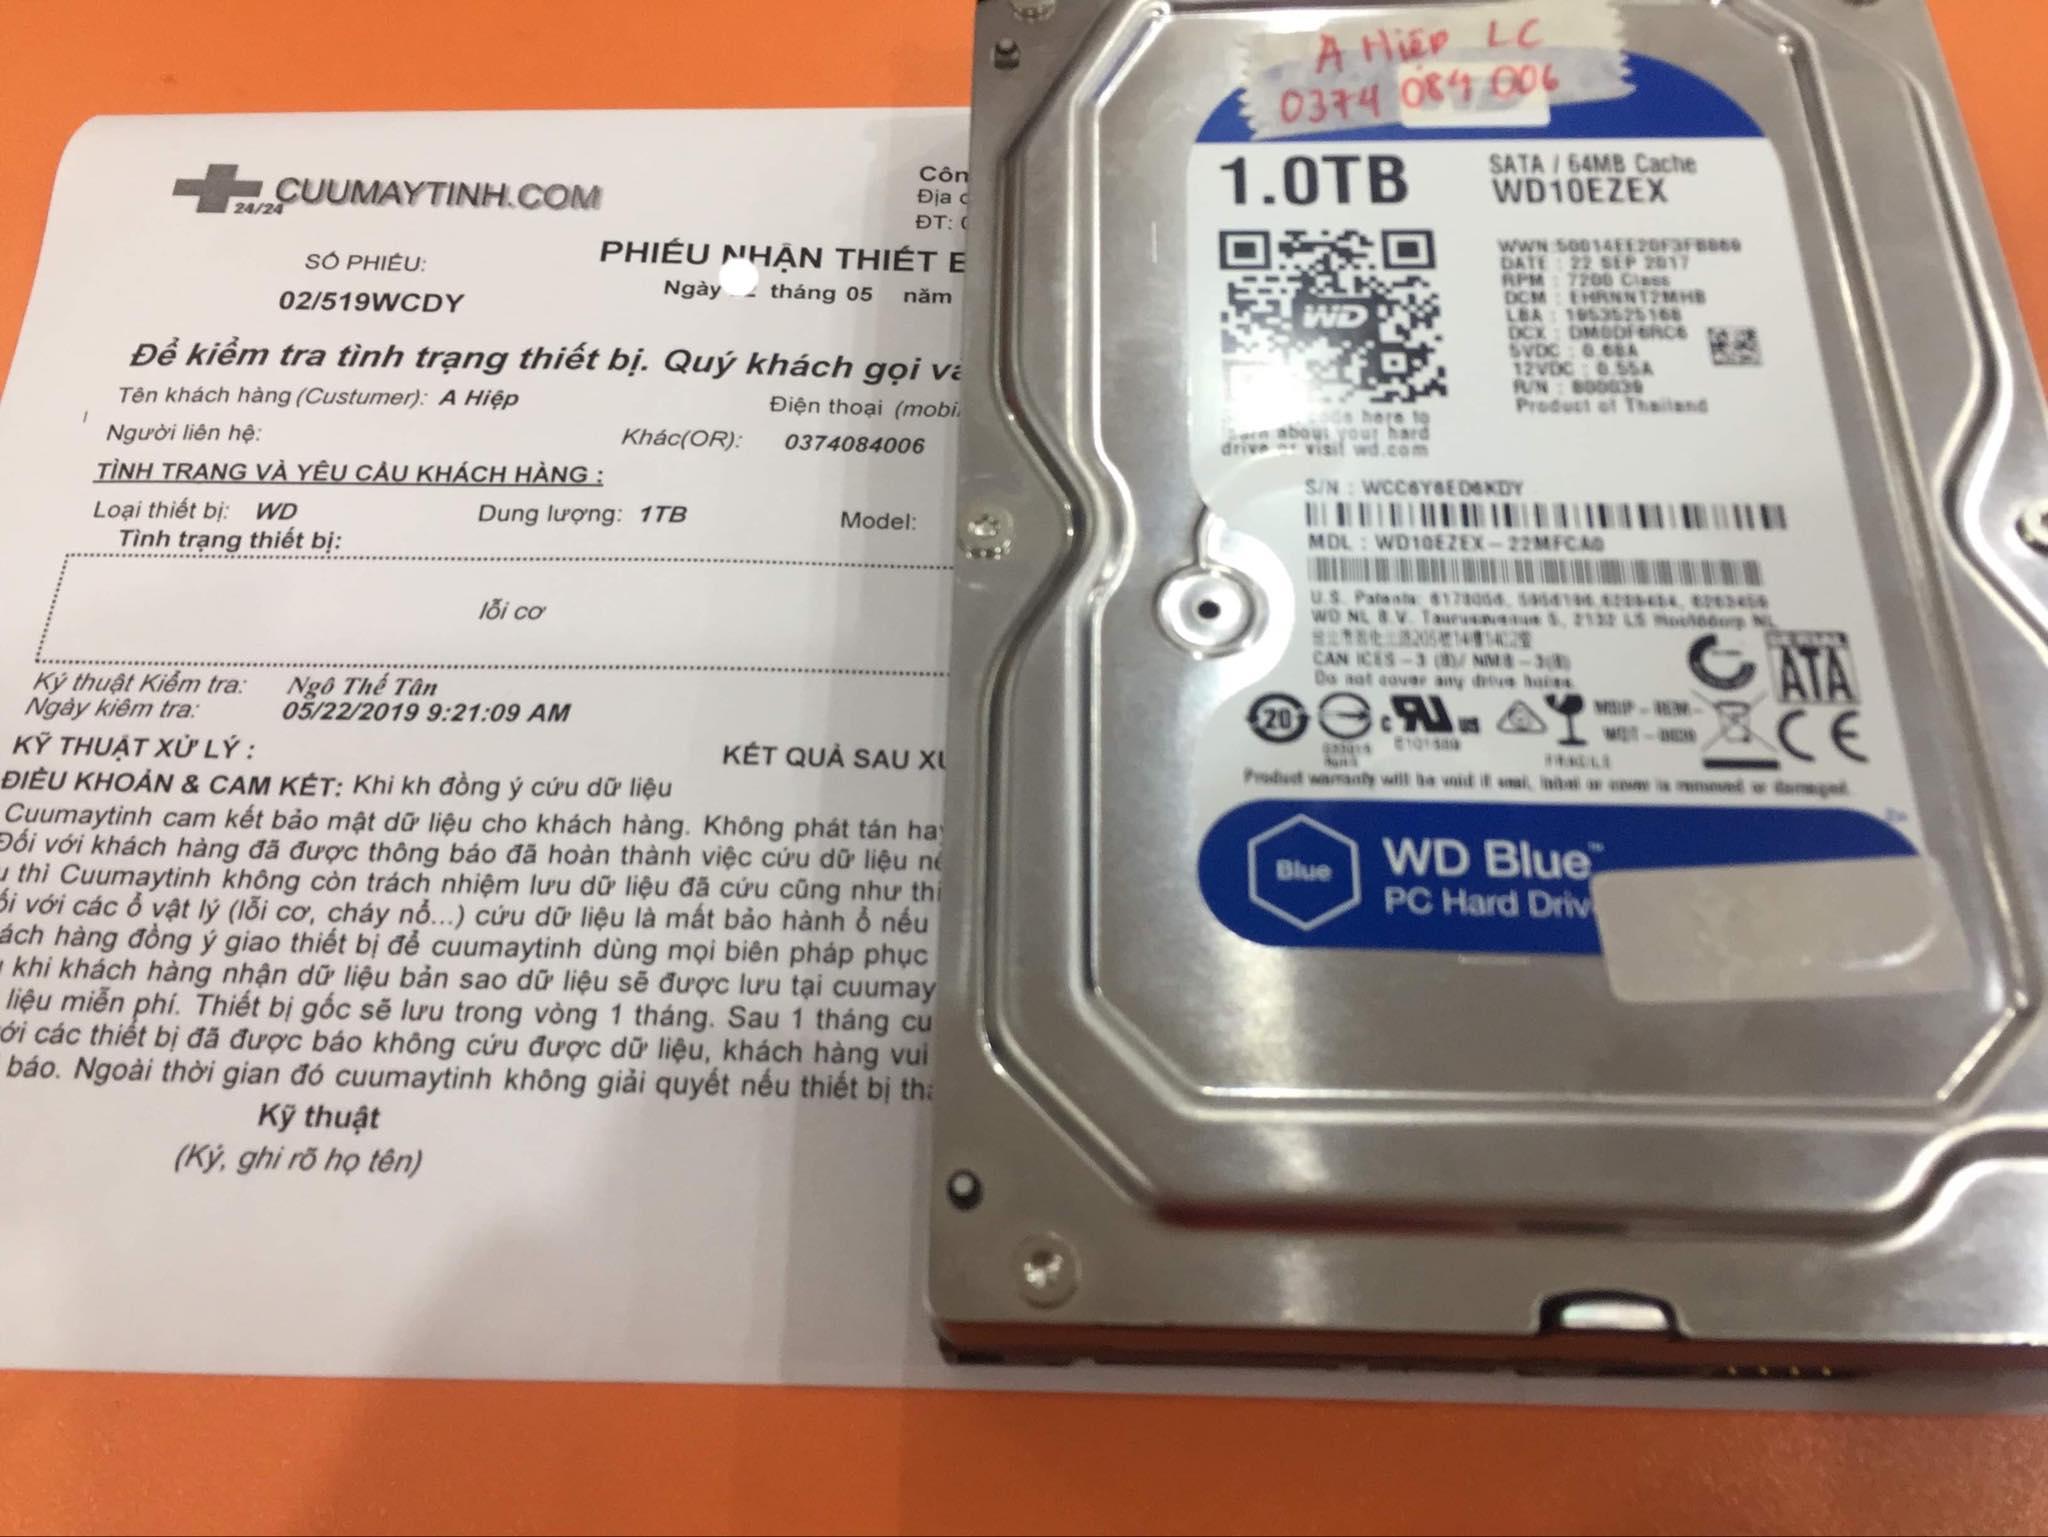 Phục hồi dữ liệu ổ cứng Western 1TB lỗi cơ 24/05/2019 - cuumaytinh